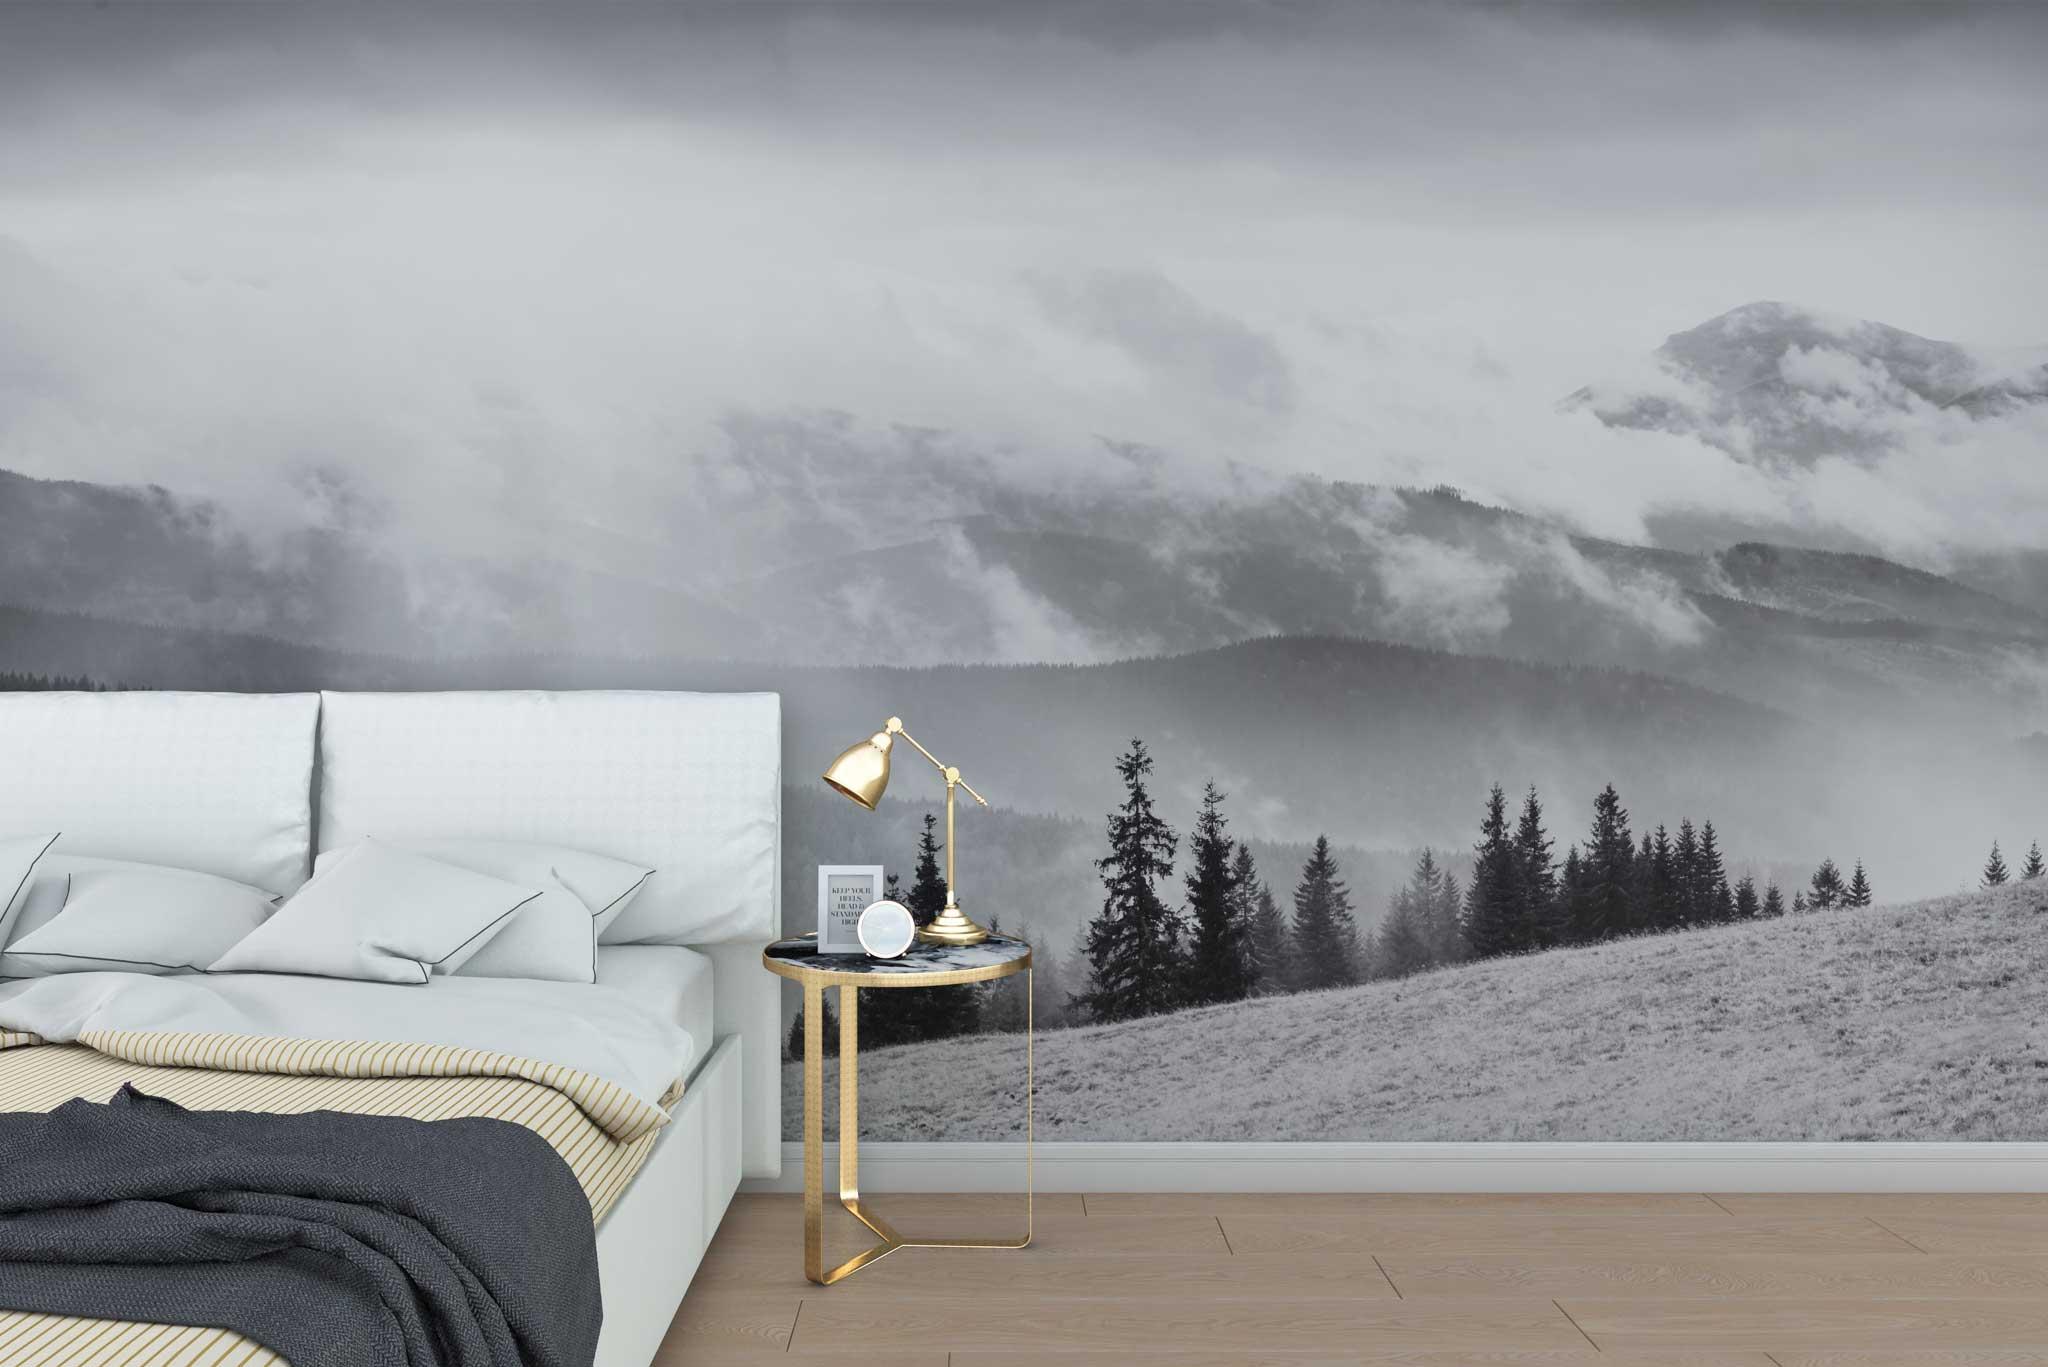 tapet-fototapet-special-personalizat-customizabil-comanda-bucuresti-daring-prints-model-fotografie-alb-negru-peisaj-munti-brazi-ceata